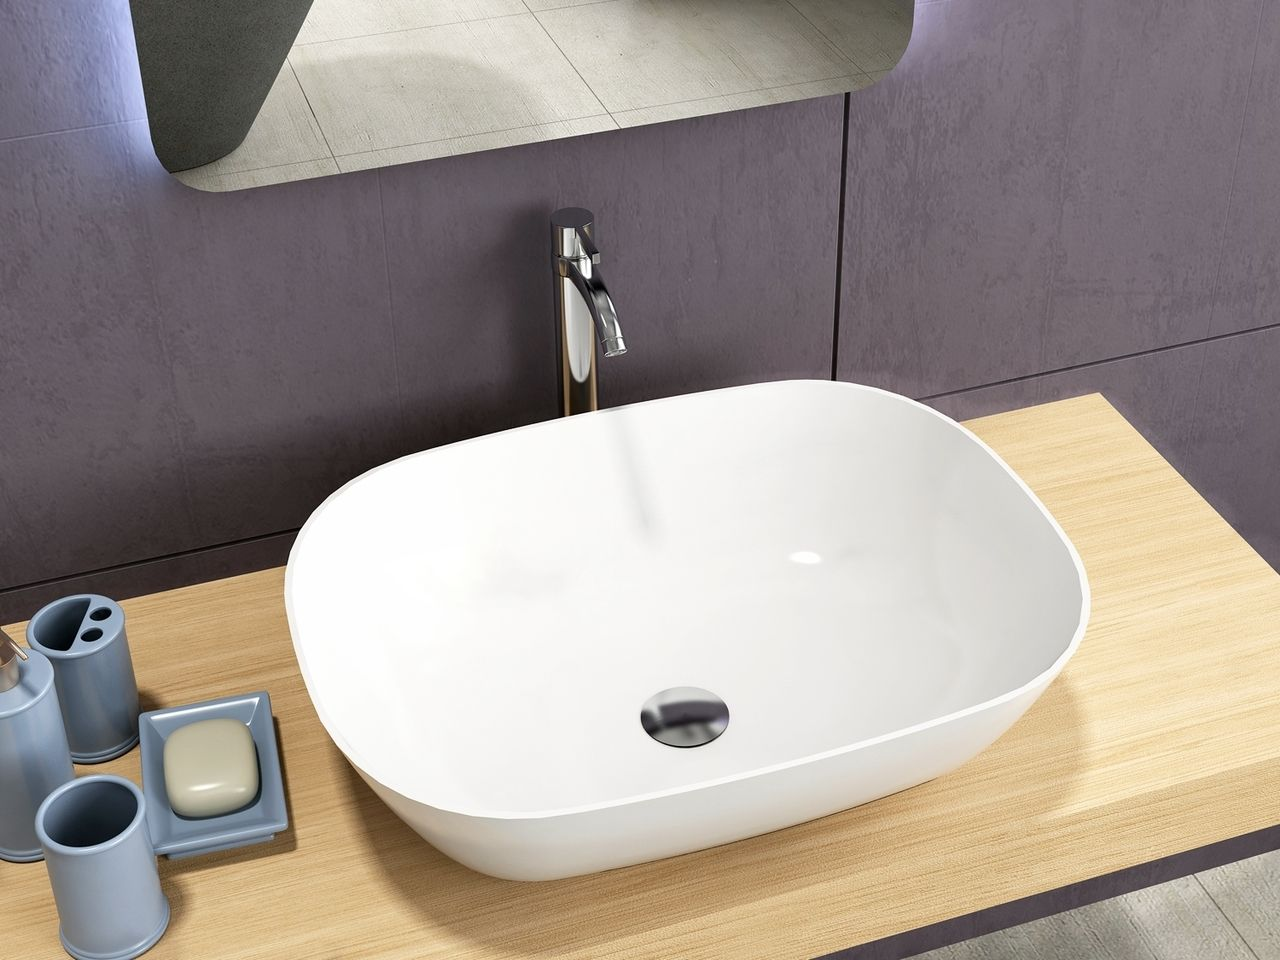 90210 Kitchen U0026 Bath   Great Quality, Affordable Pricing On Freestanding  Bathtubs, Bathroom Vanities, Sinks